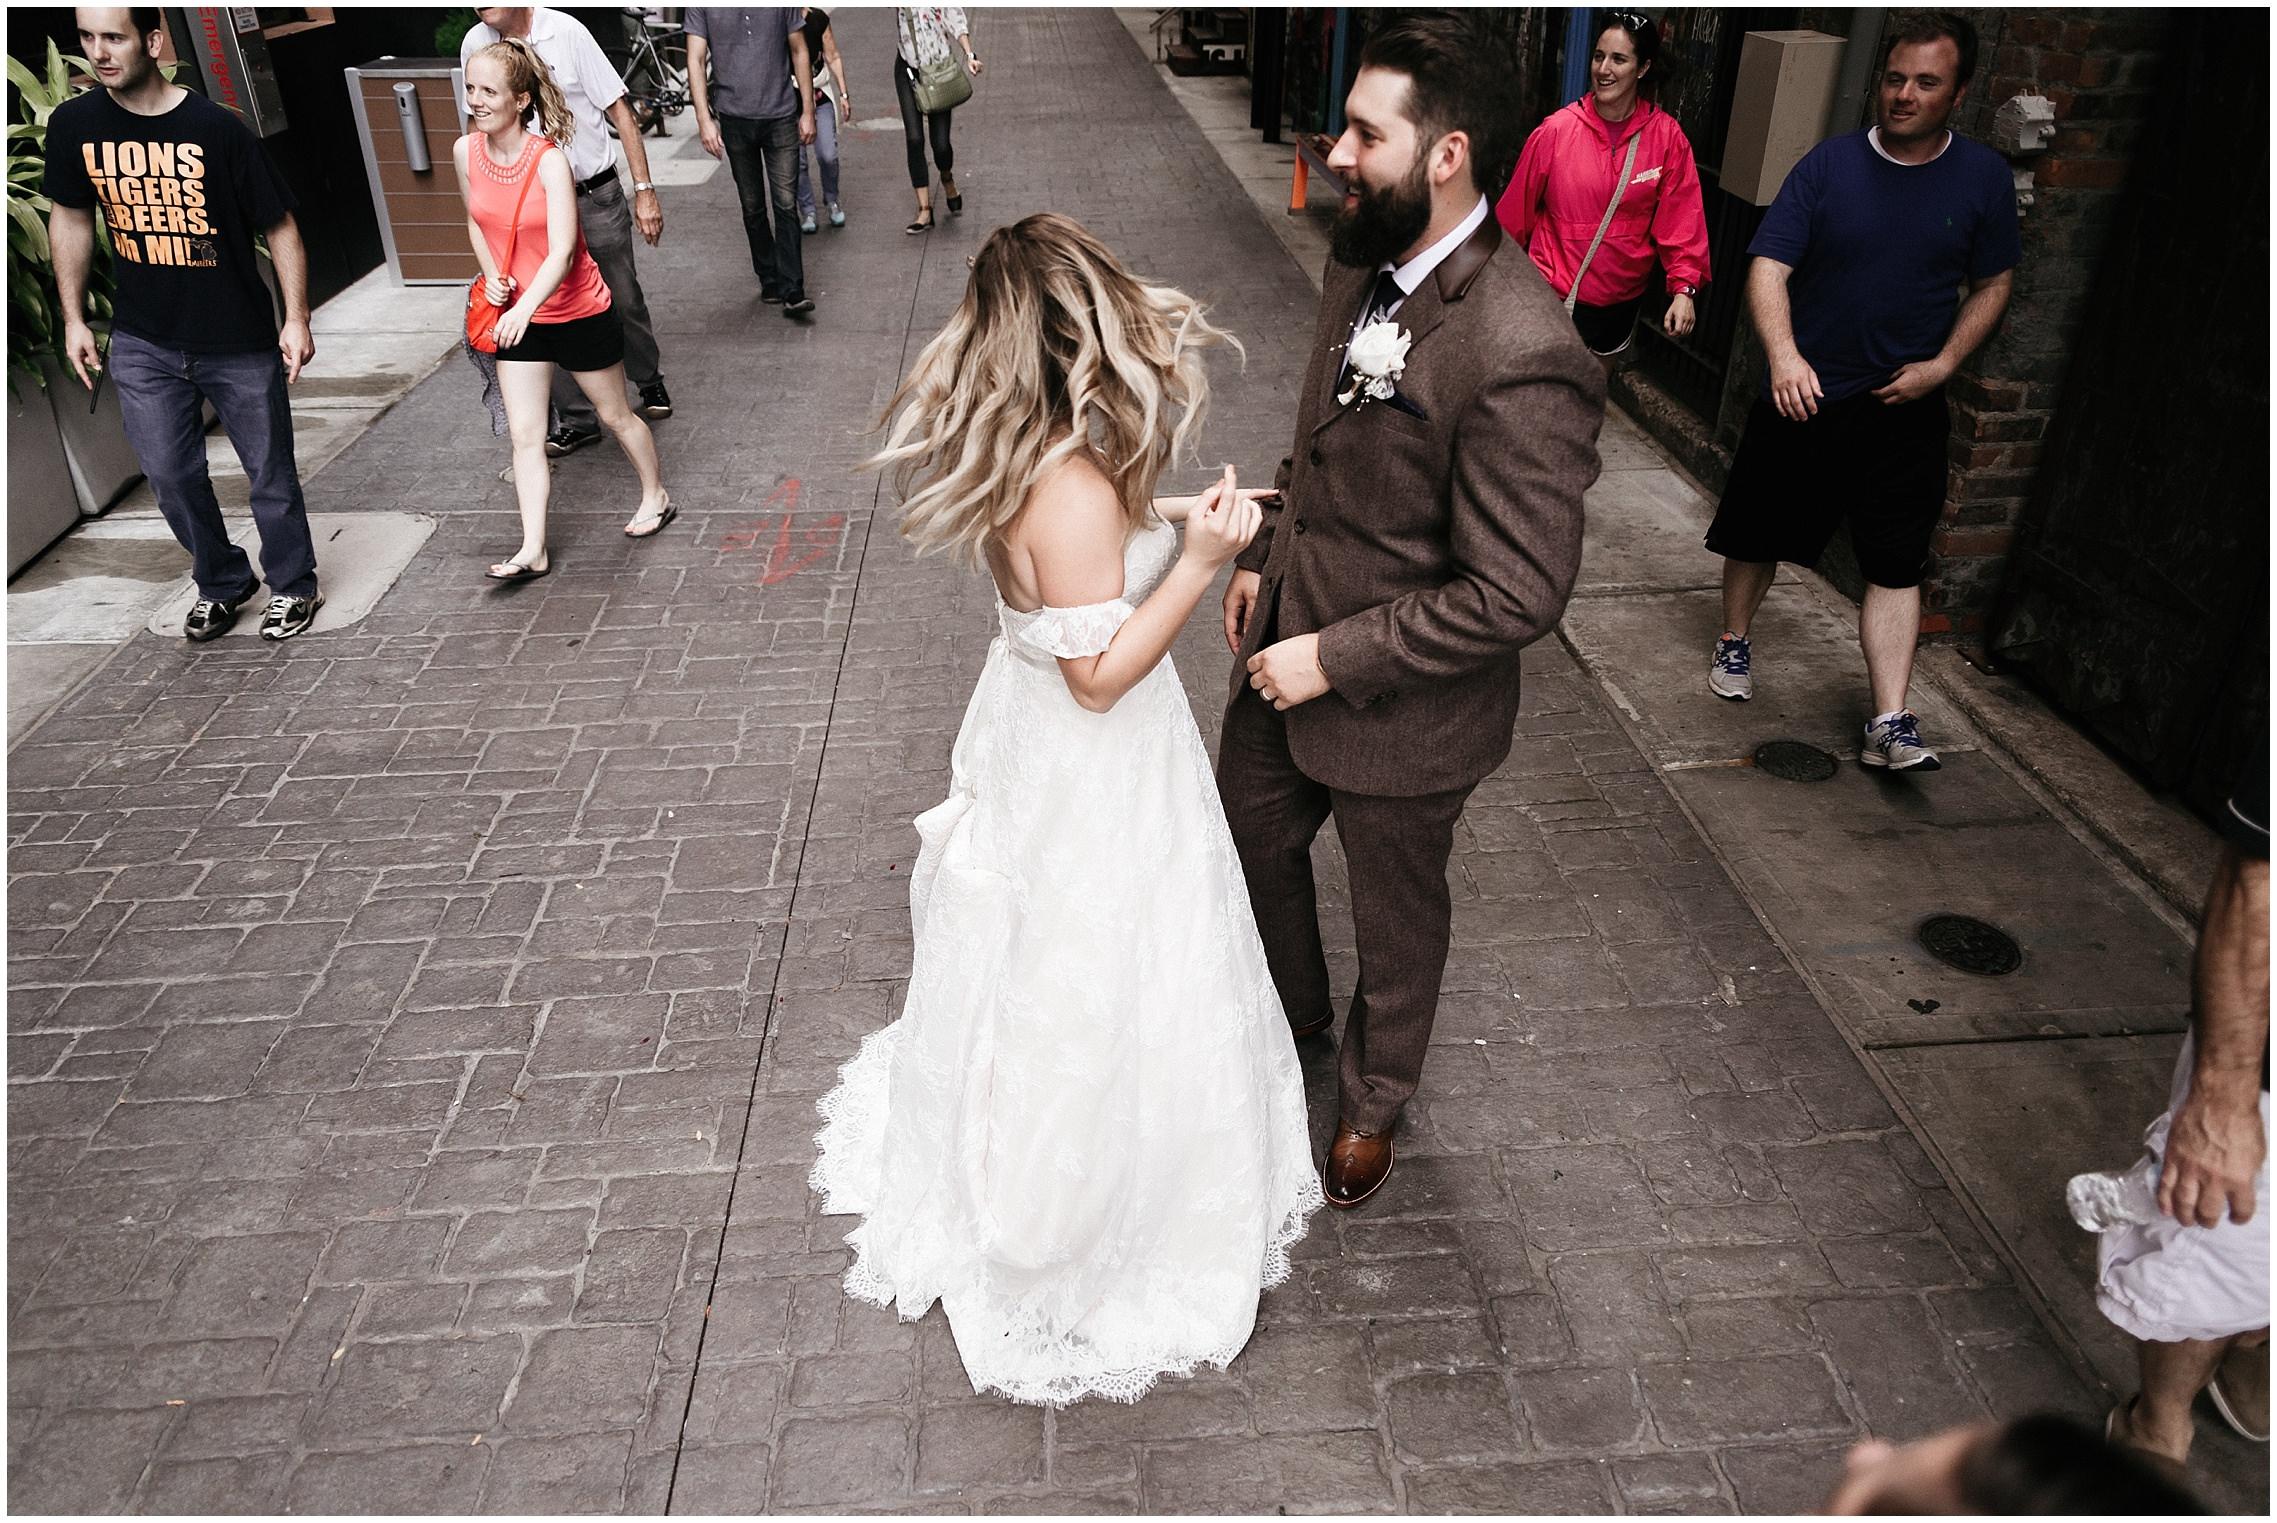 brick_and_mortar_colorado_wedding_photographer_0239.jpg